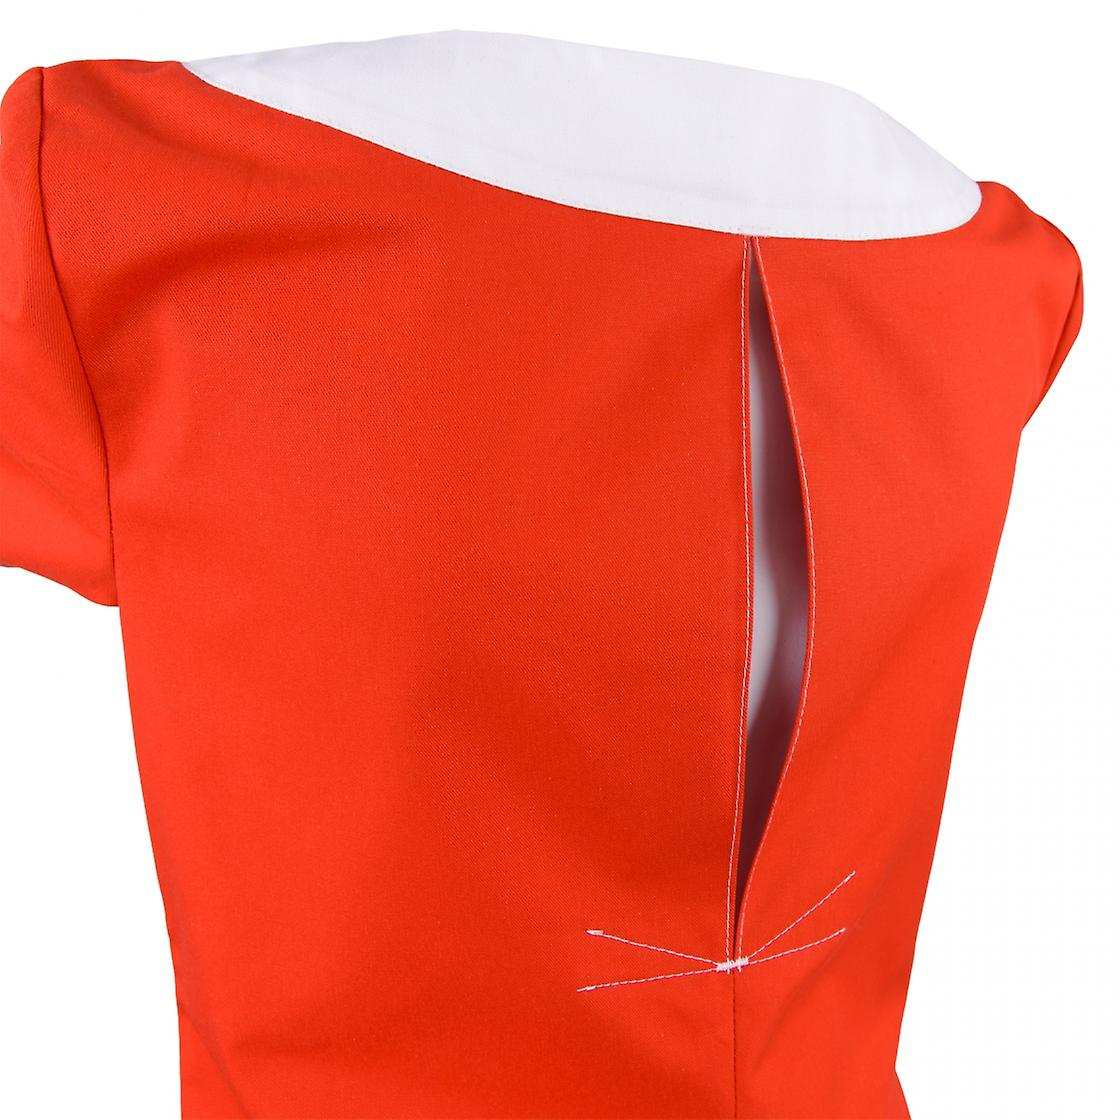 Anolo Kasack, ladies' bag, slip bag, nursing bag, red, hospital, pharmacy, red cross, 1/2 arm, 100% cotton (sanfor), German fabric, made in EU